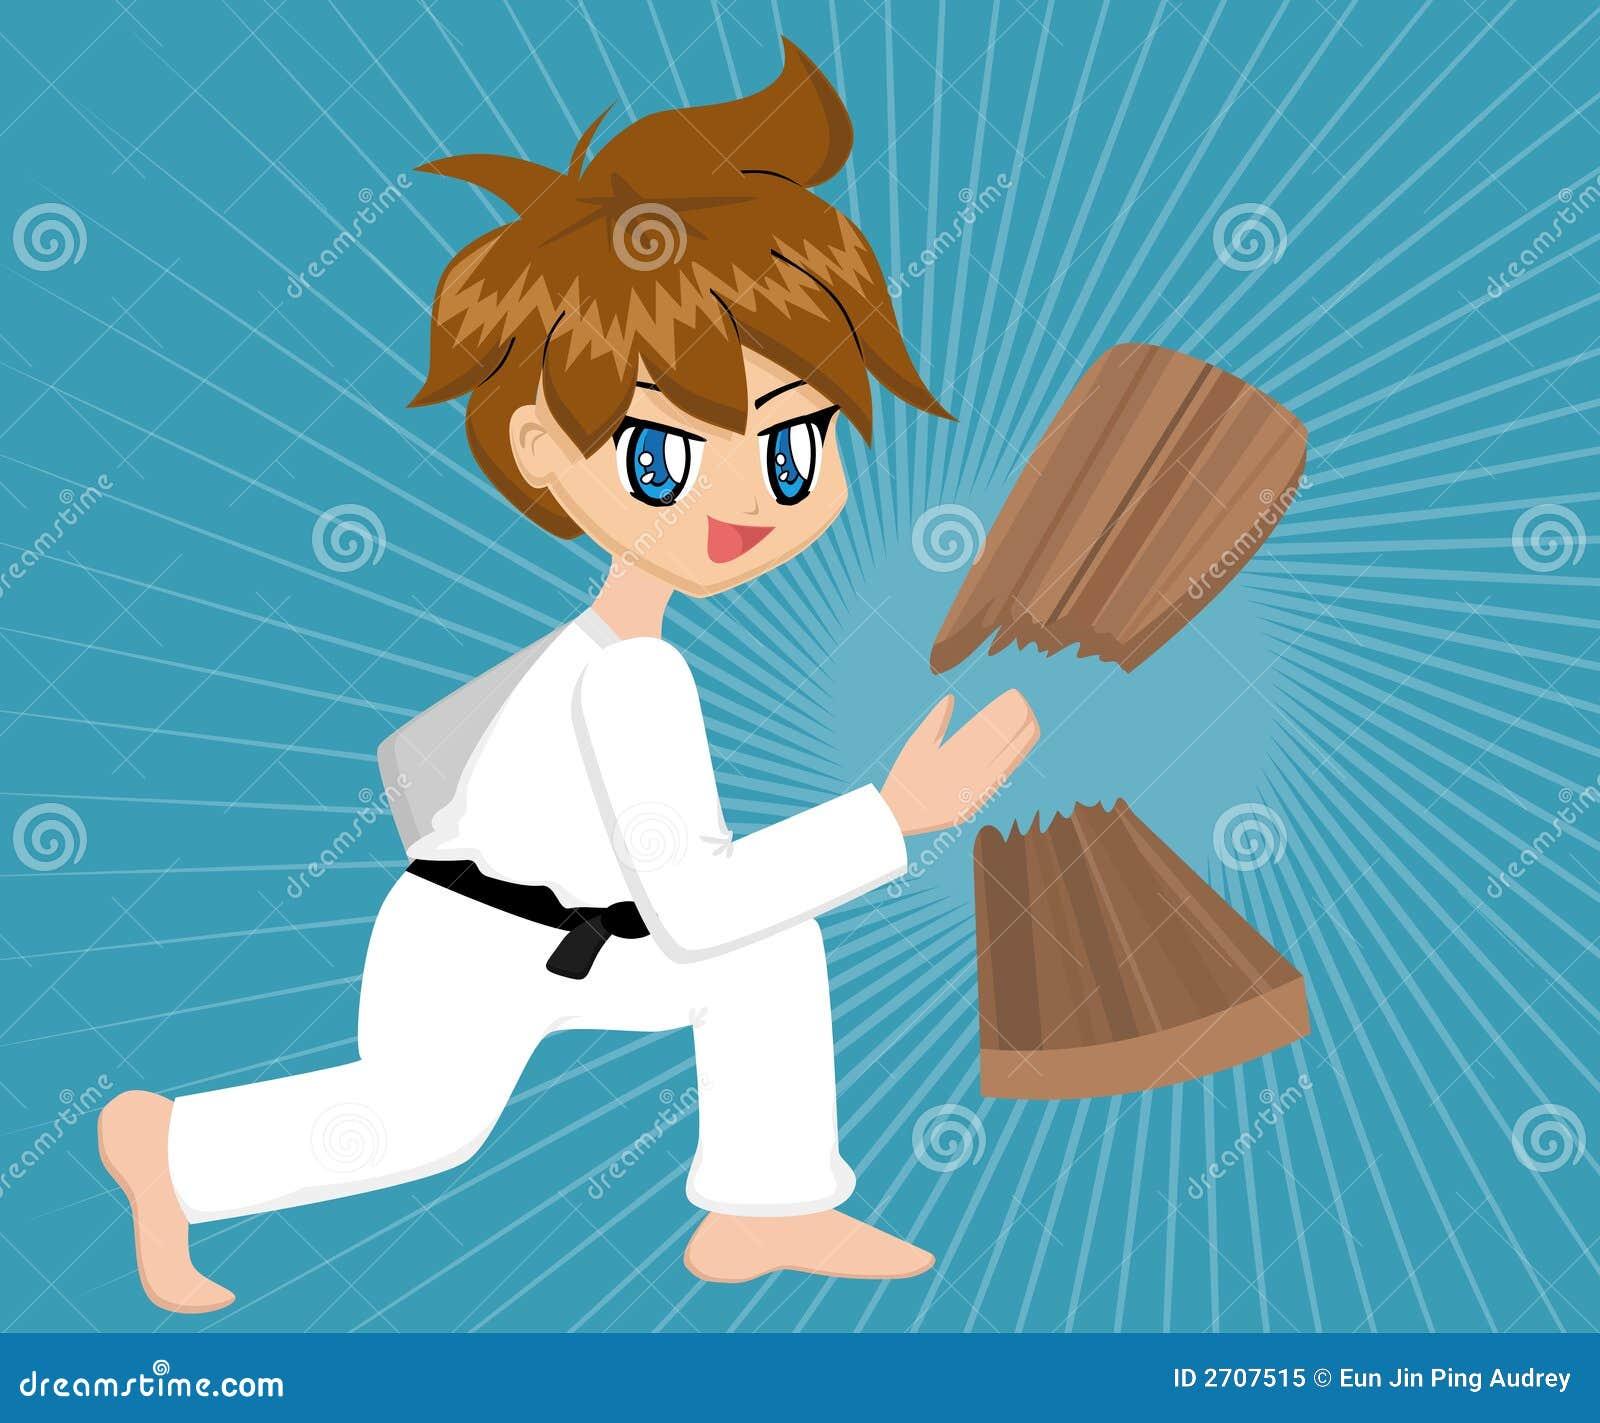 Cartoon Karate BoyBlack Karate Cartoon